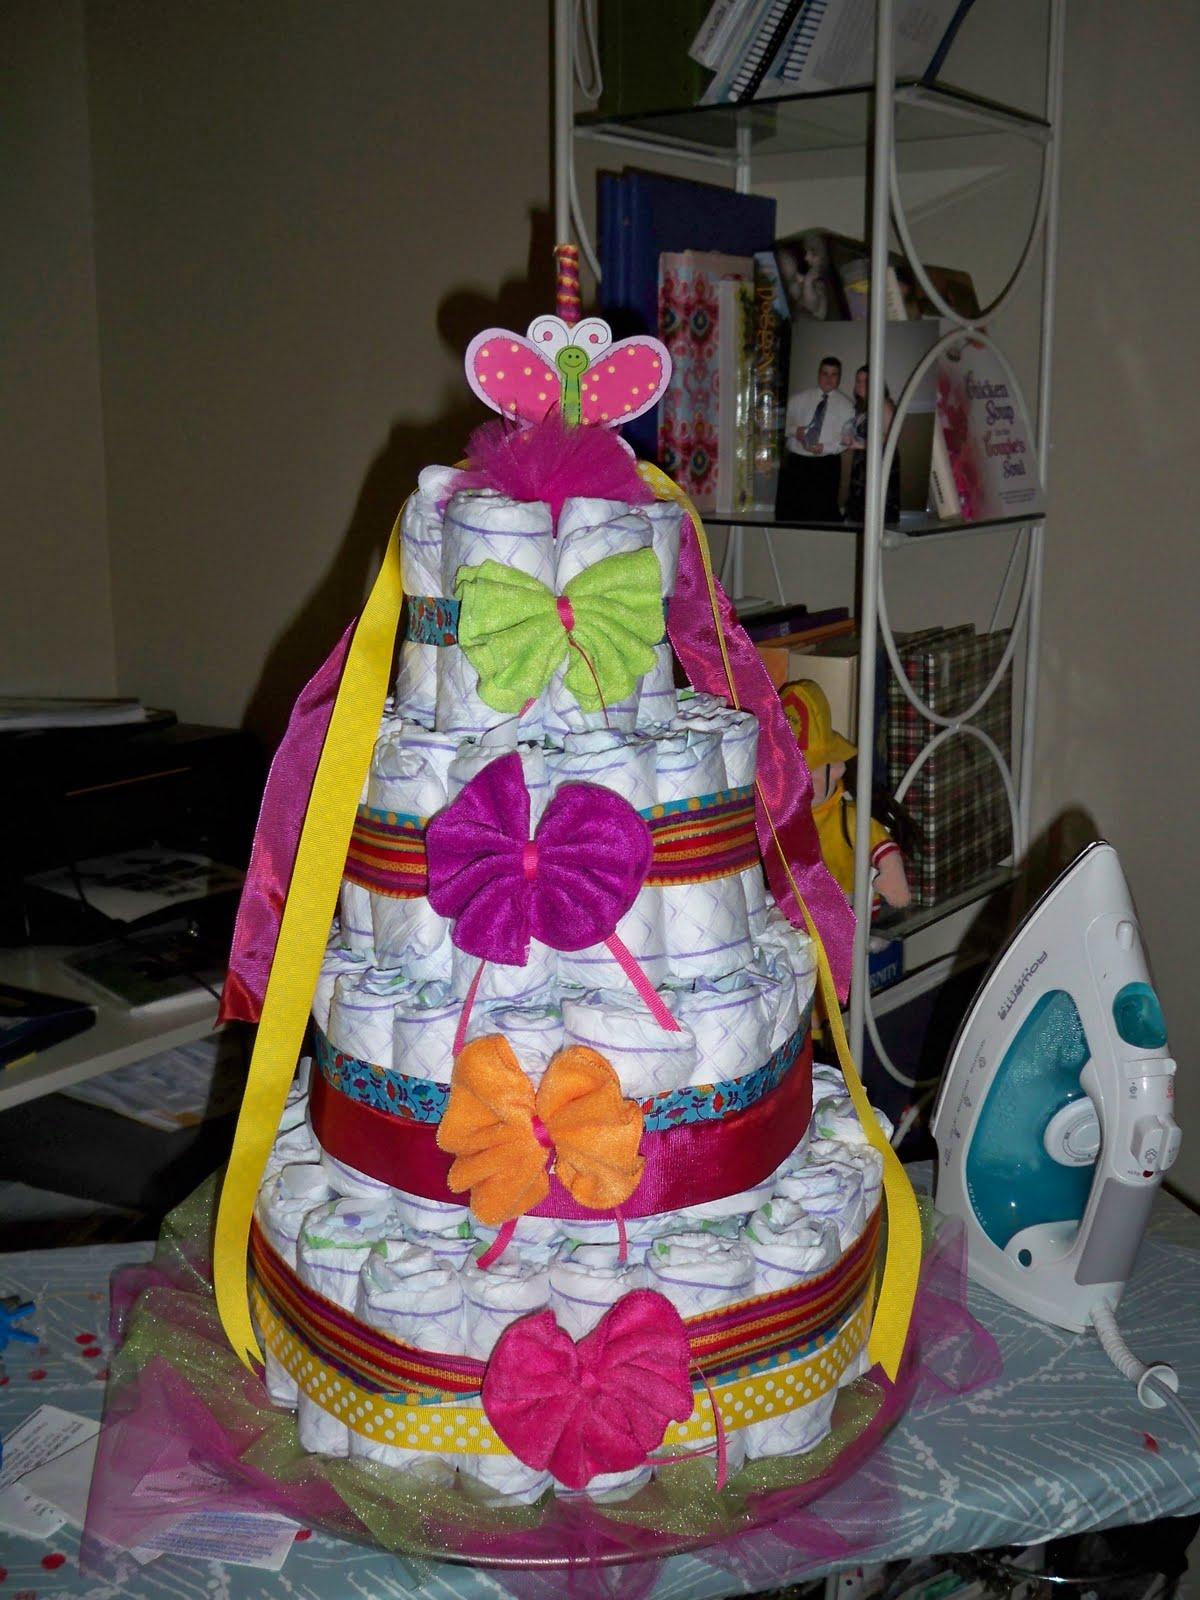 Rosenbergh Fam Diaper Cake Supplies